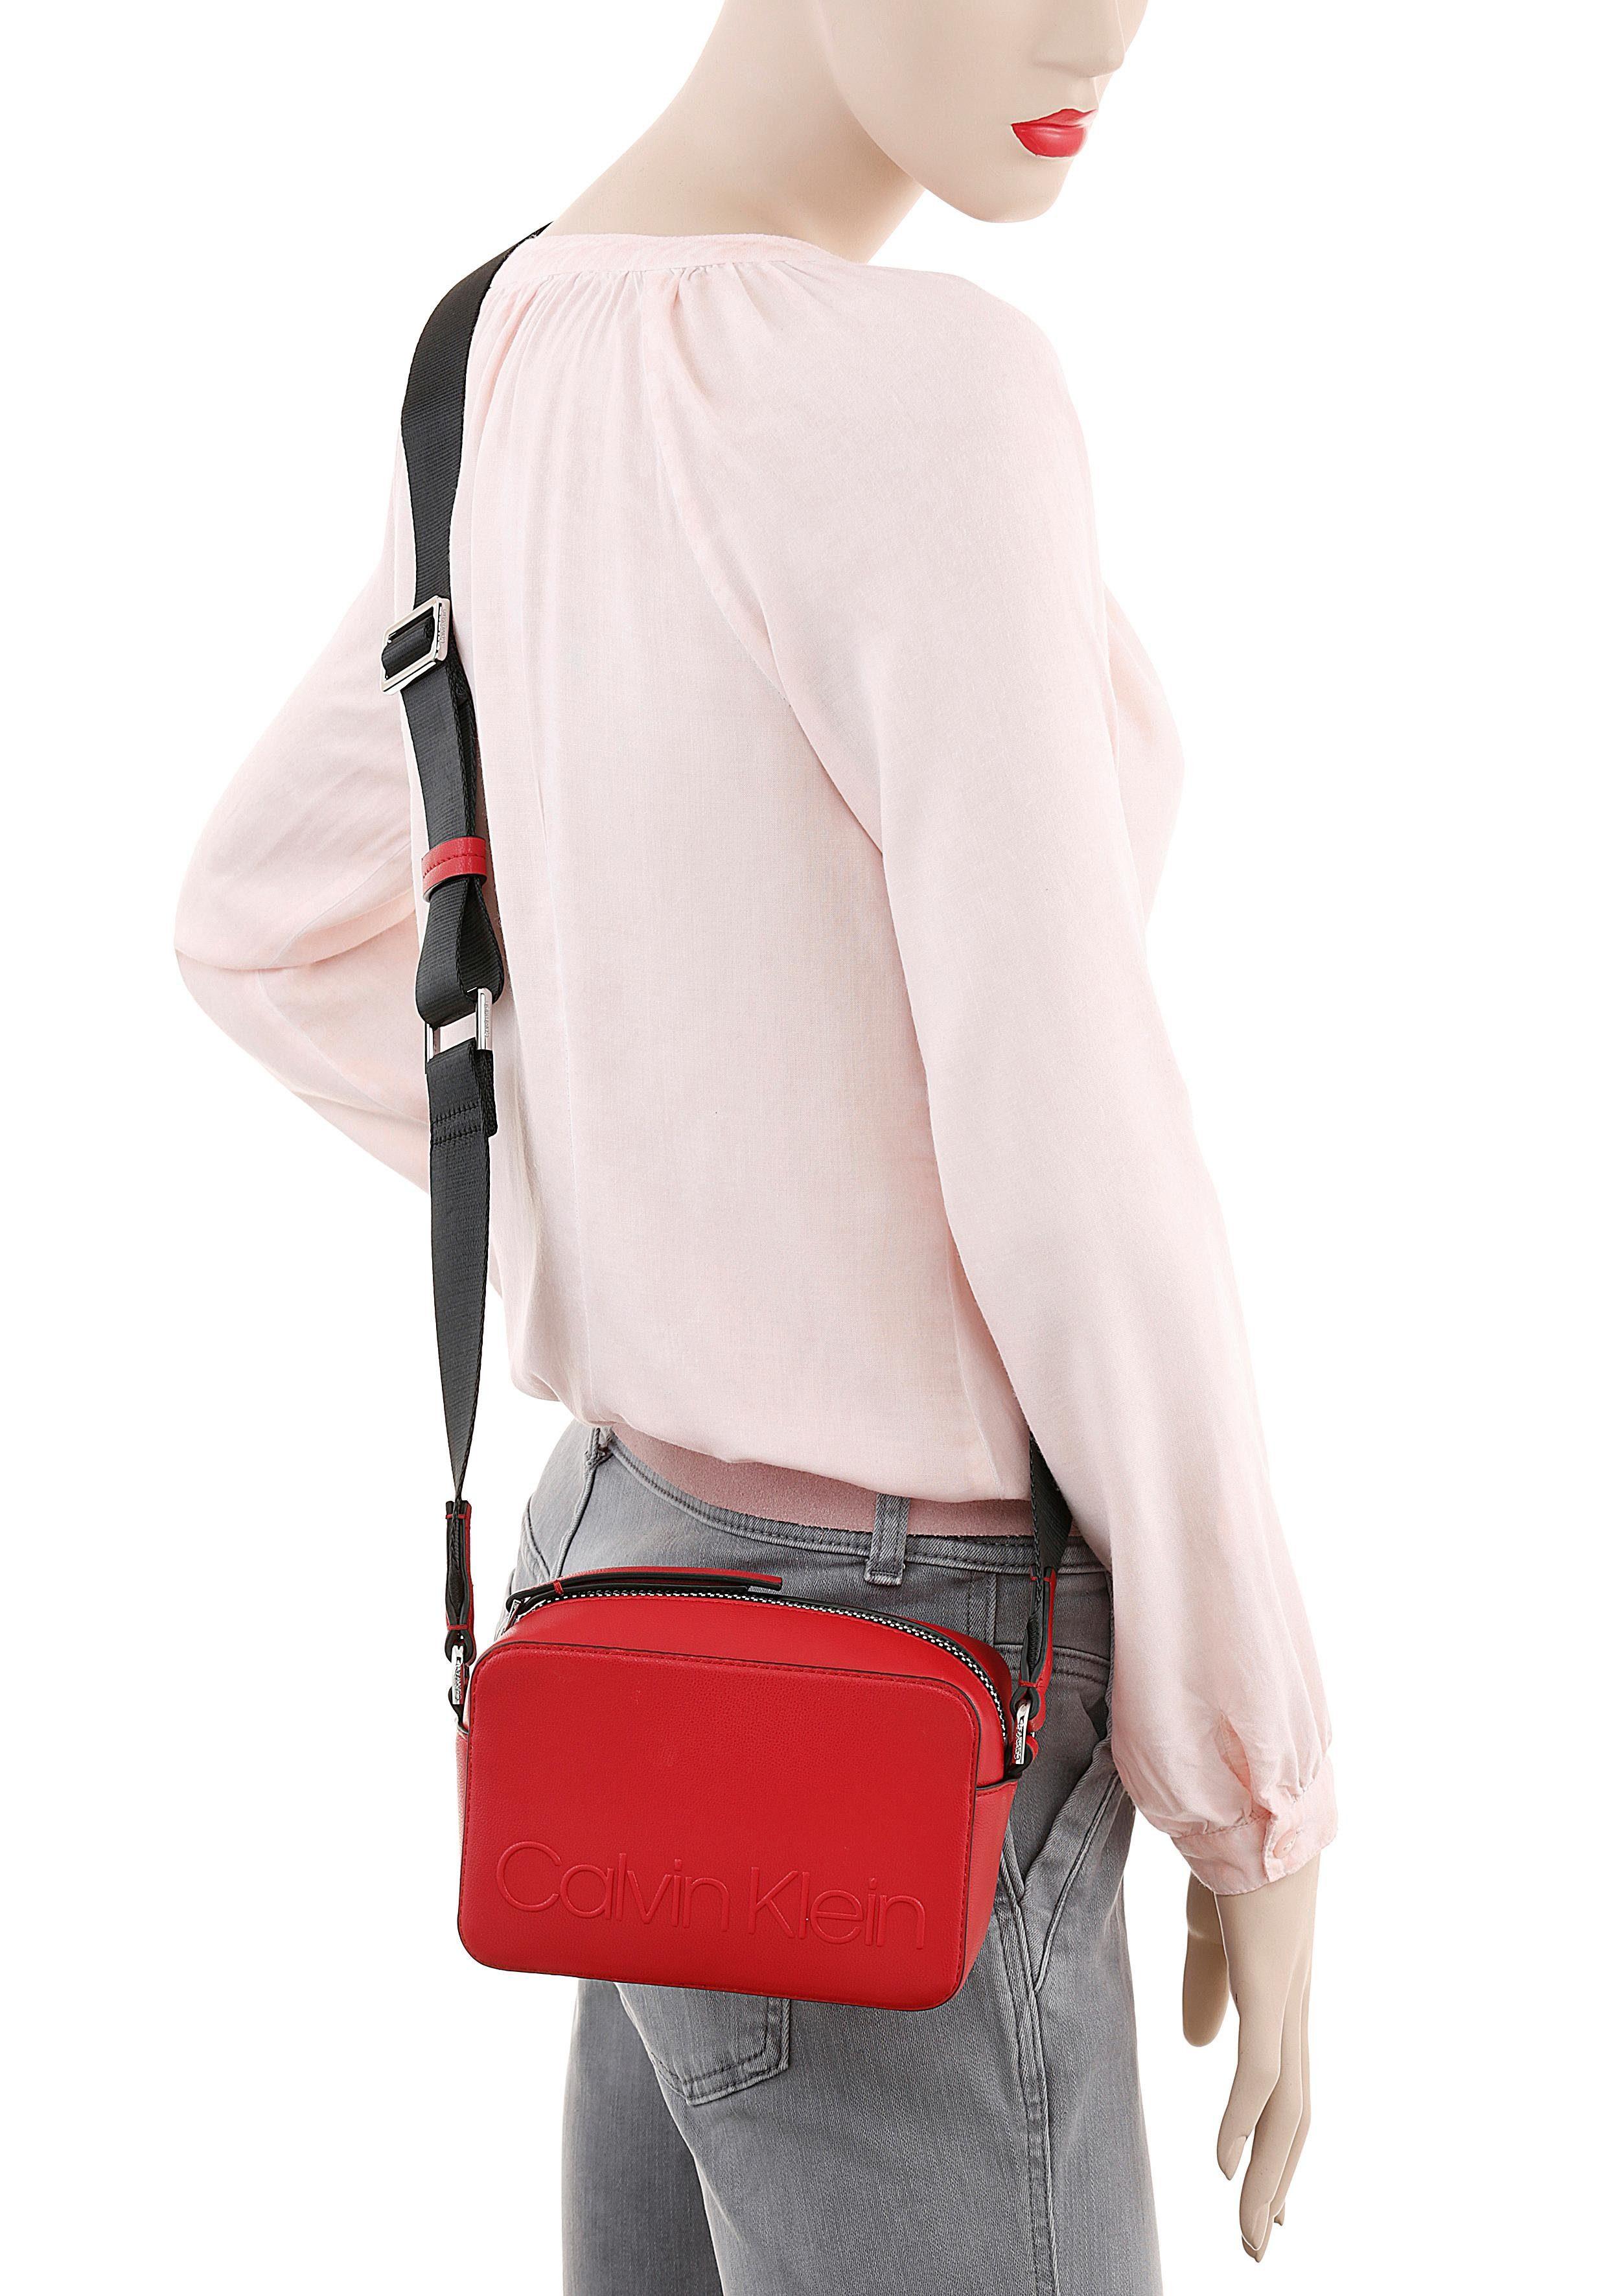 Praktischem Klein In Bag« Mini Format Bag »edged Calvin Camera 7On0TYwqTd